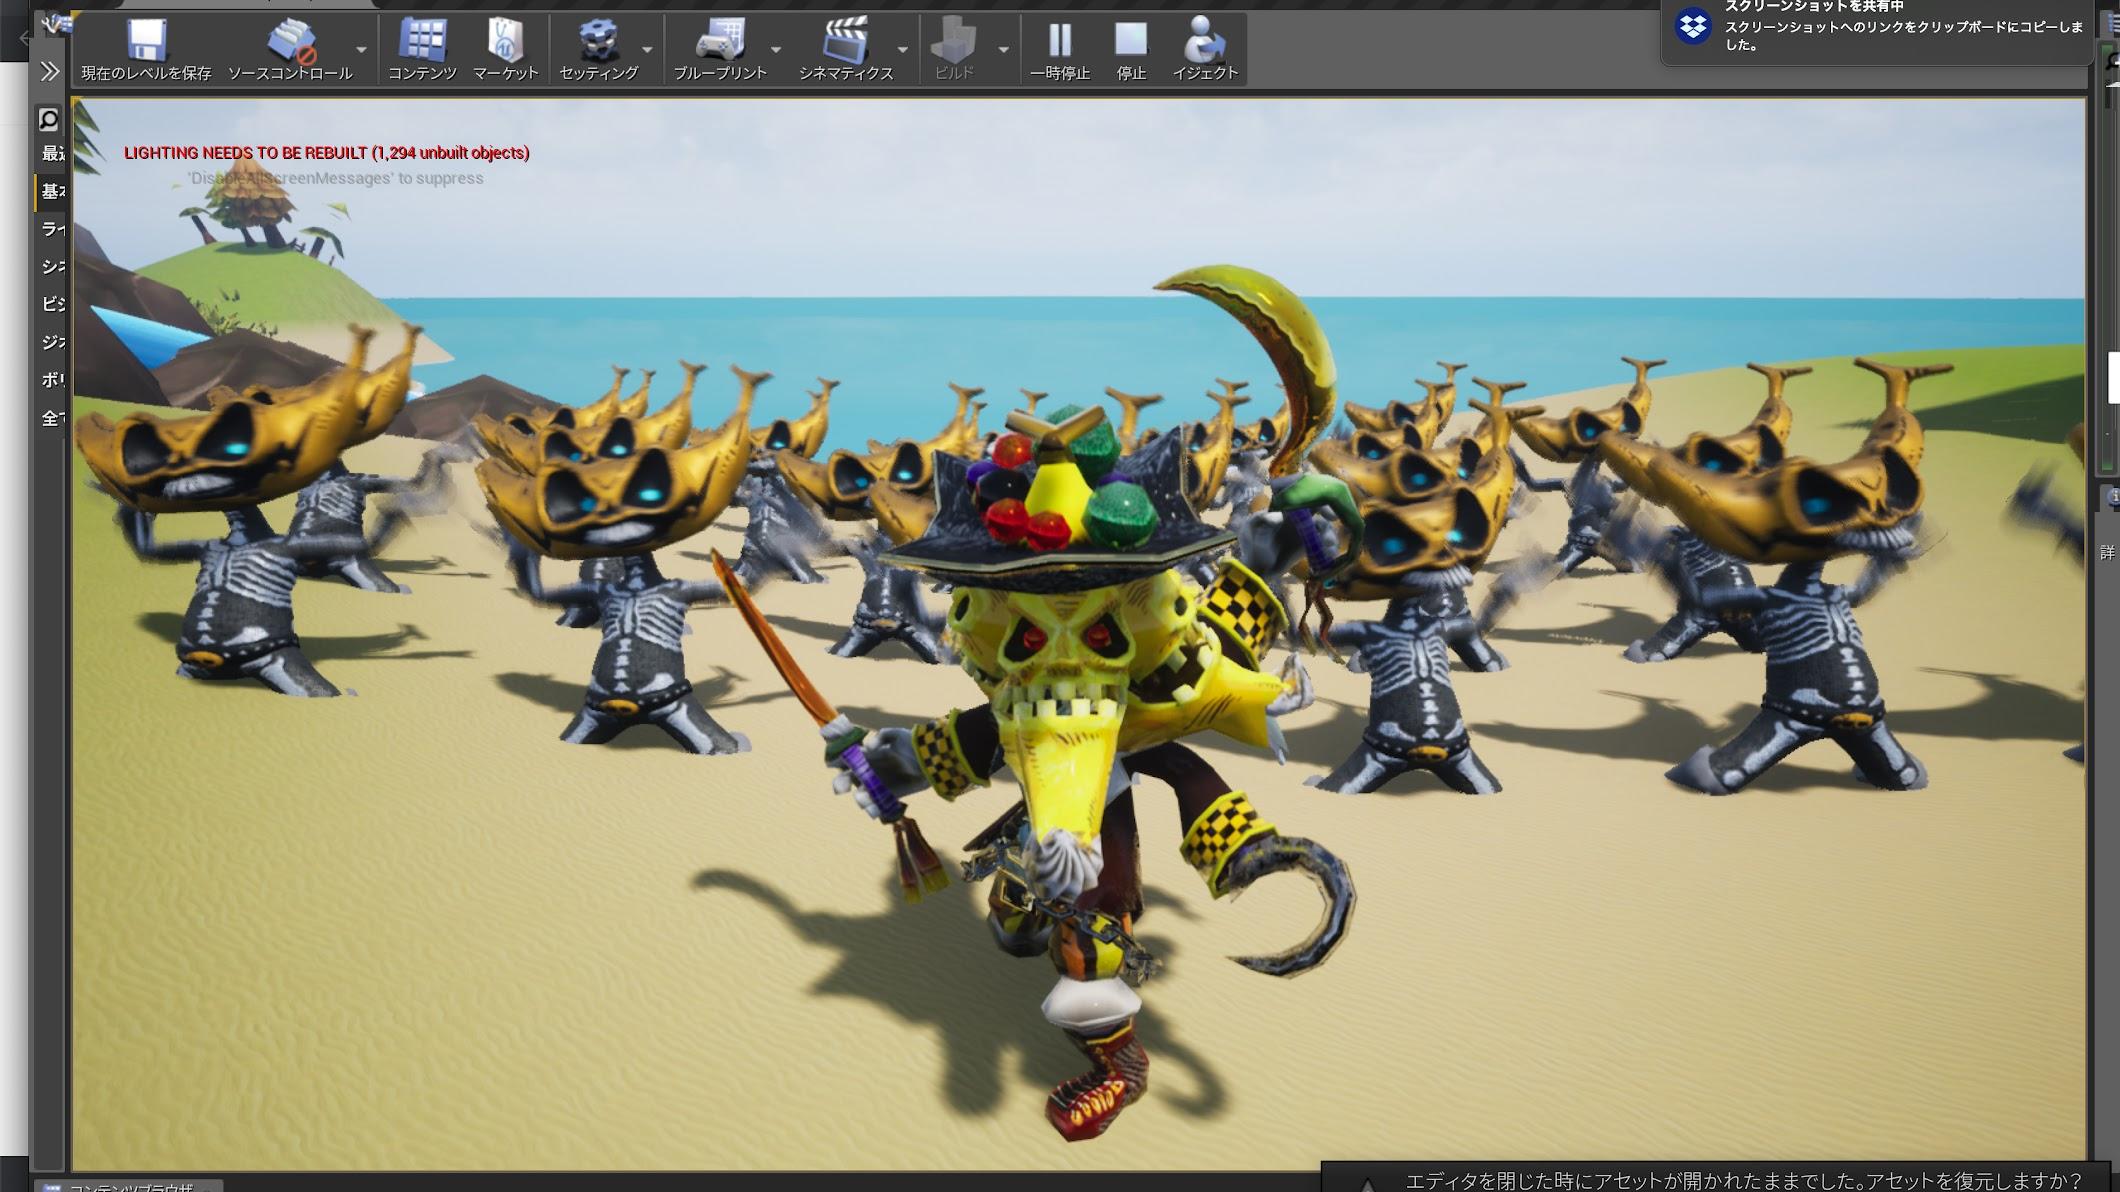 AKIRA WAKUI 3DCG works